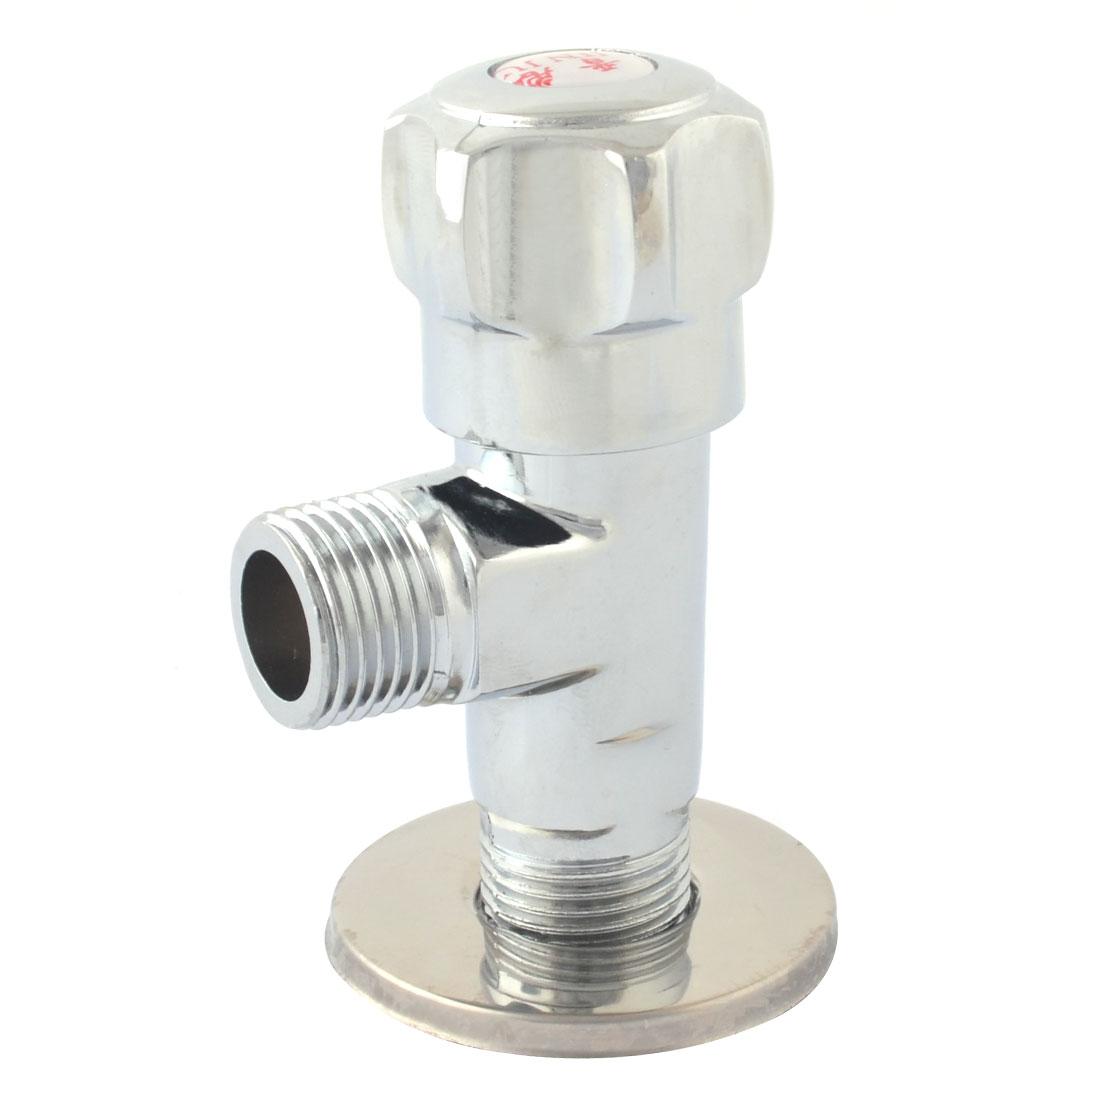 Kitchen Metal 2 Ways Round Head Water Tap Faucet Switch 20mm Thread Dia